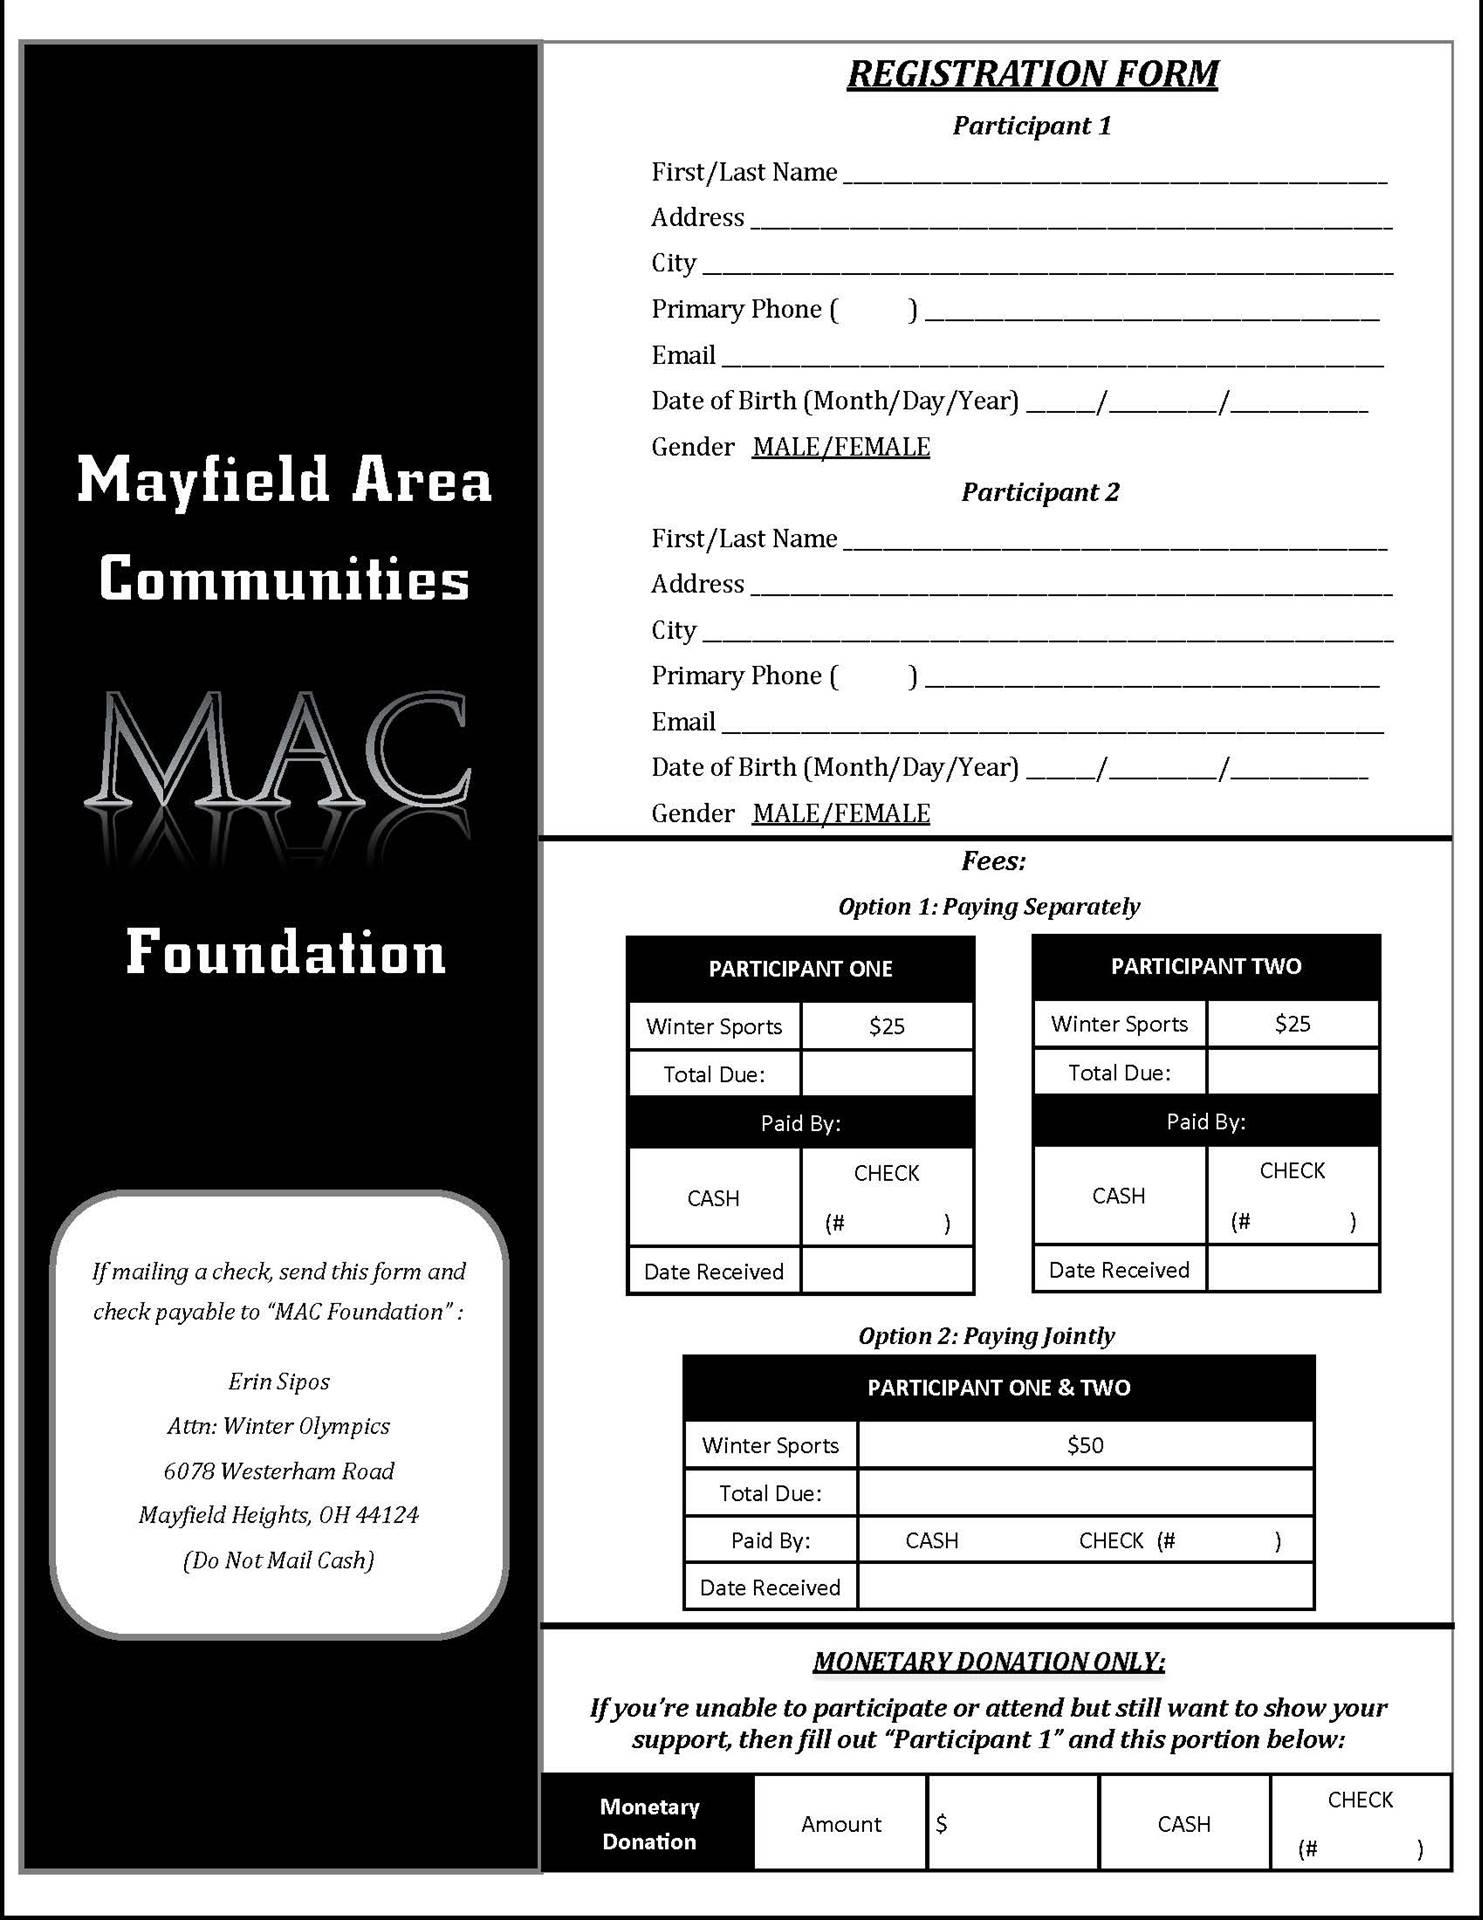 MAC Foundation Winter Olympics registration page